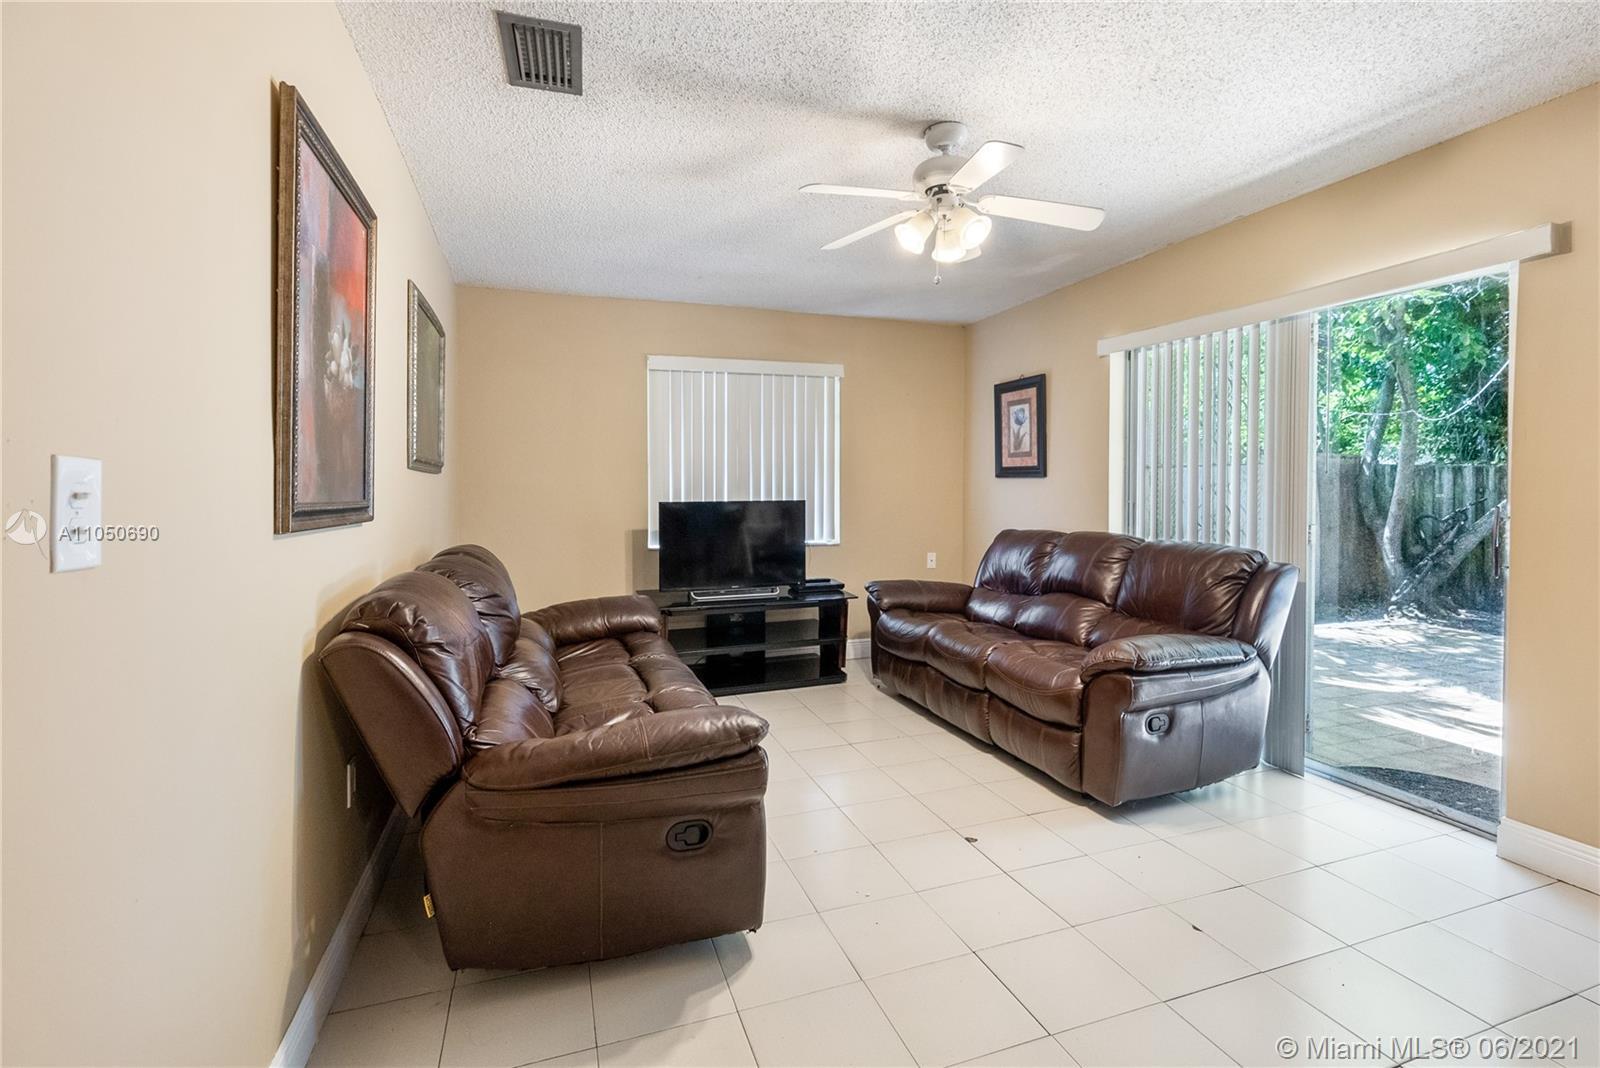 /  2957 sq. ft. $ 2021-06-21 0 Photo